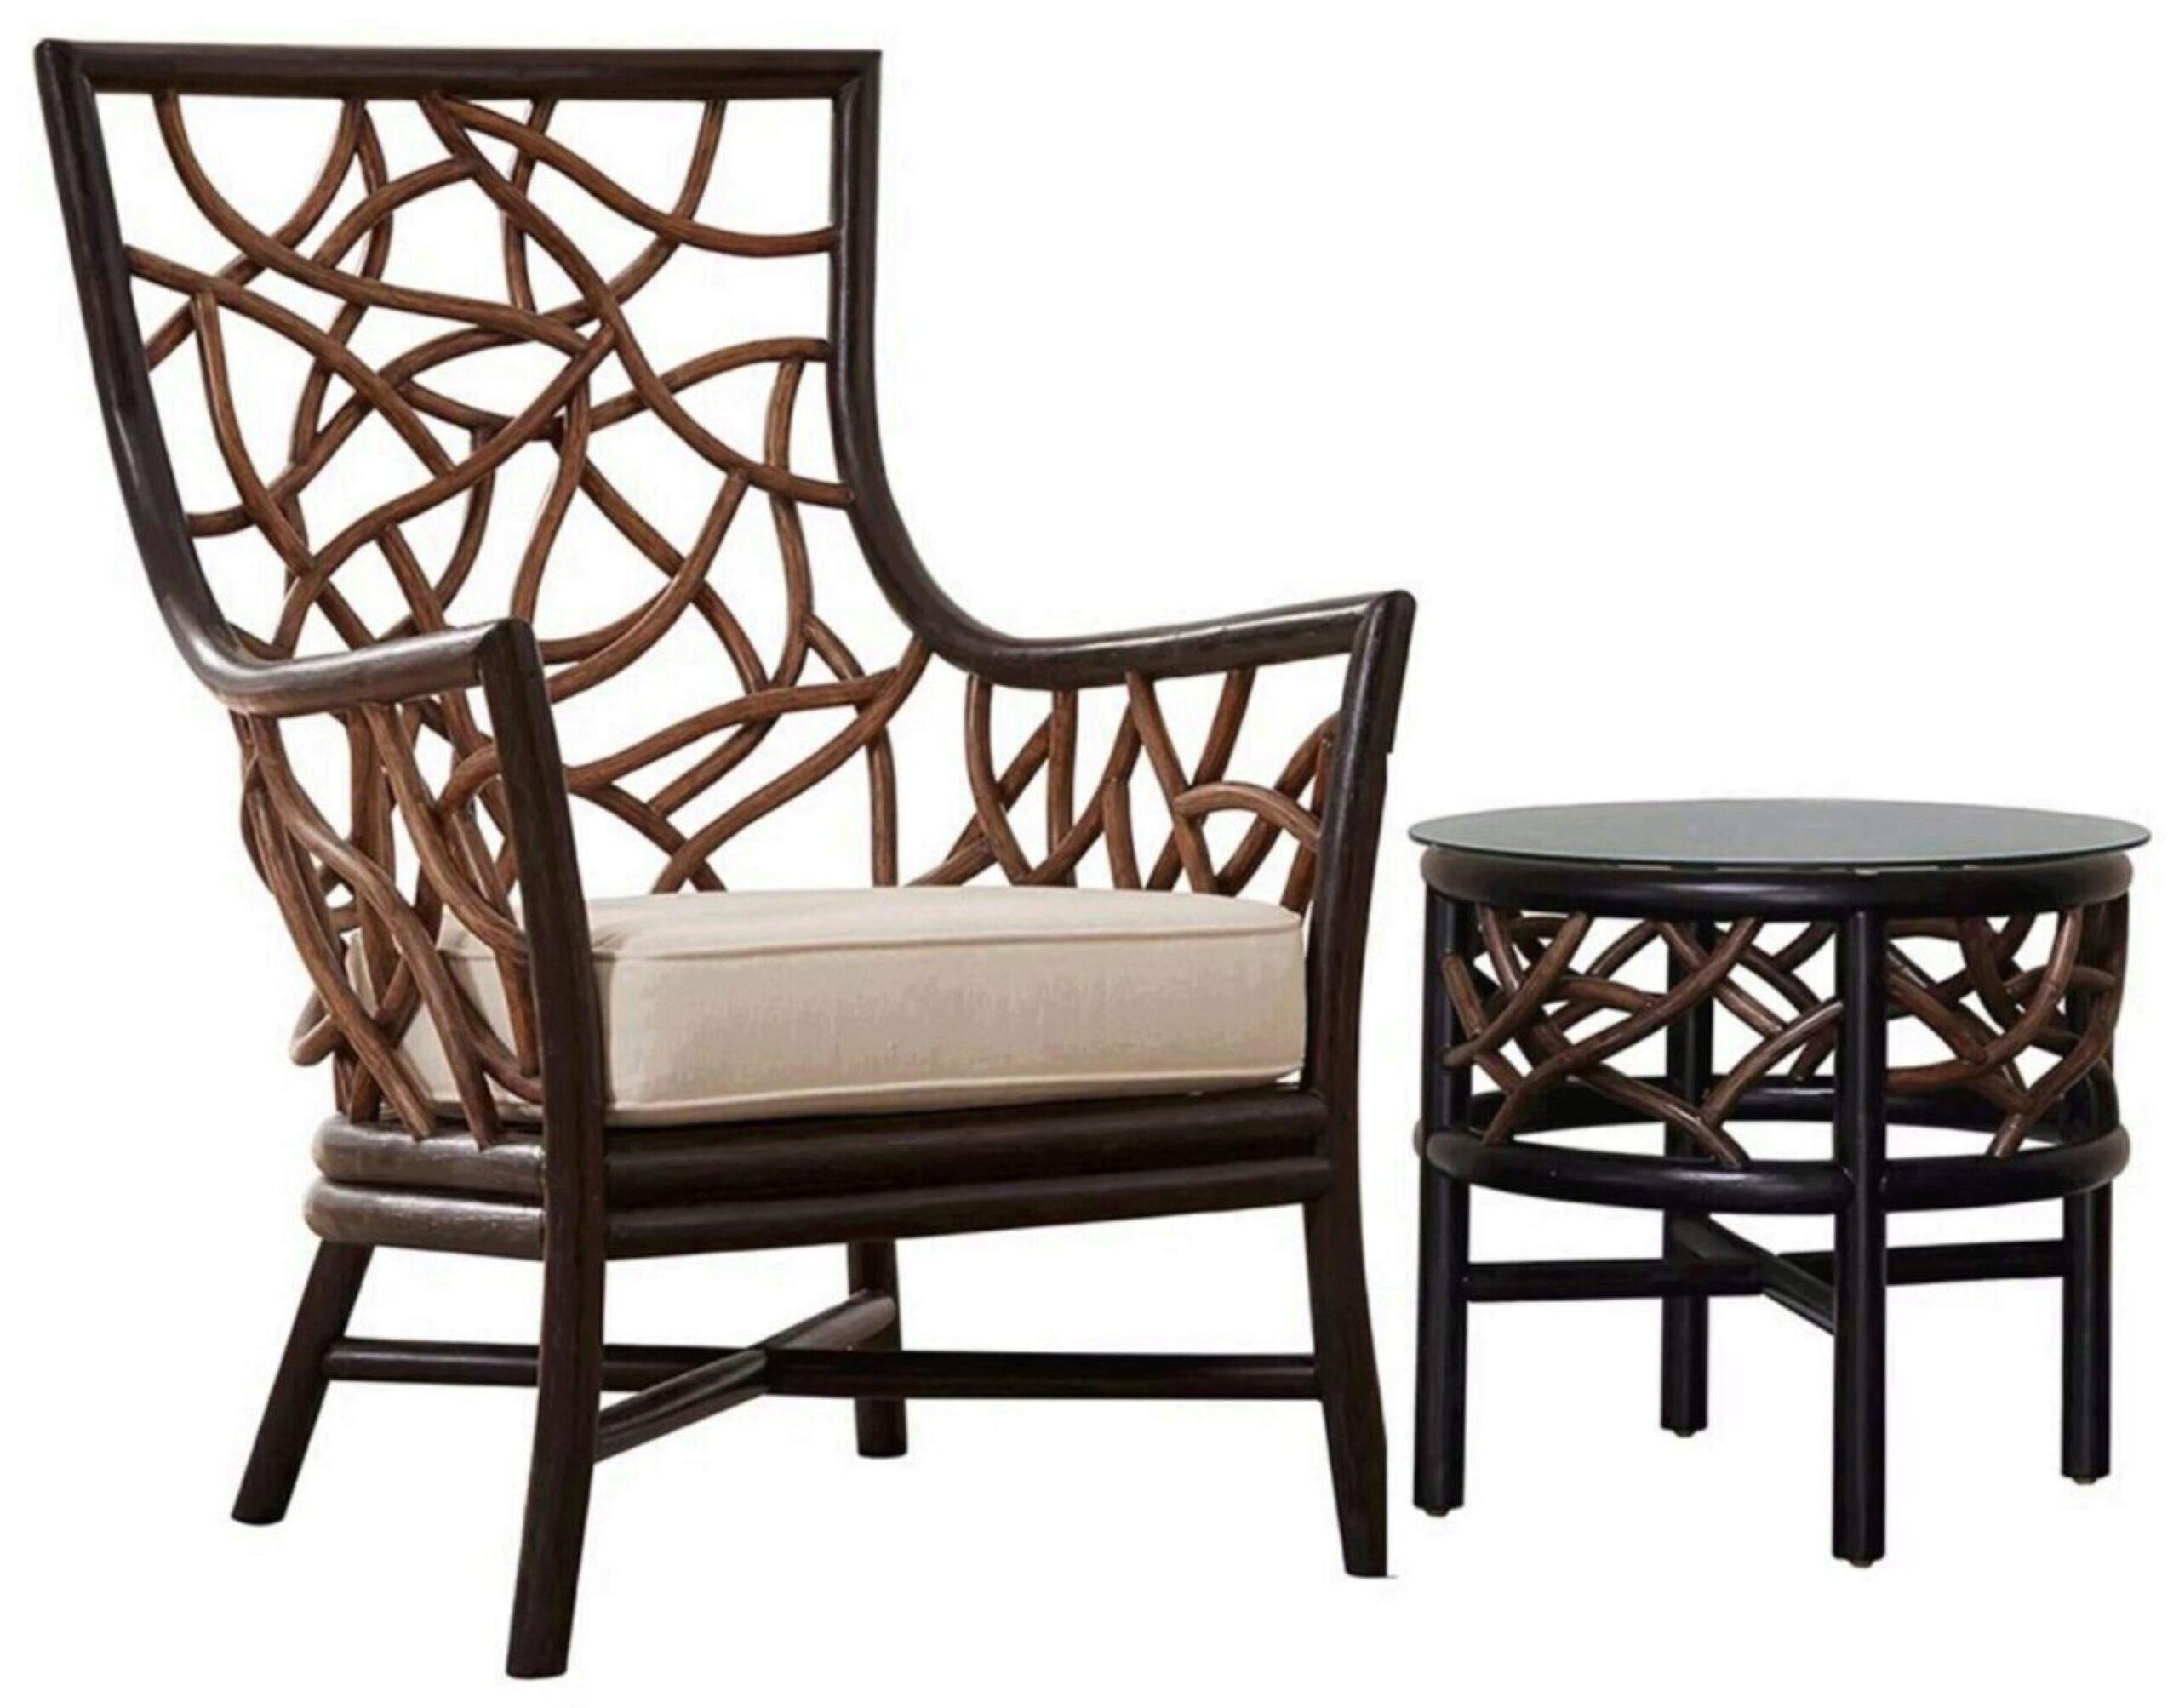 trinidad occasional chair w cushion pjs 1401 blk oc panama jack